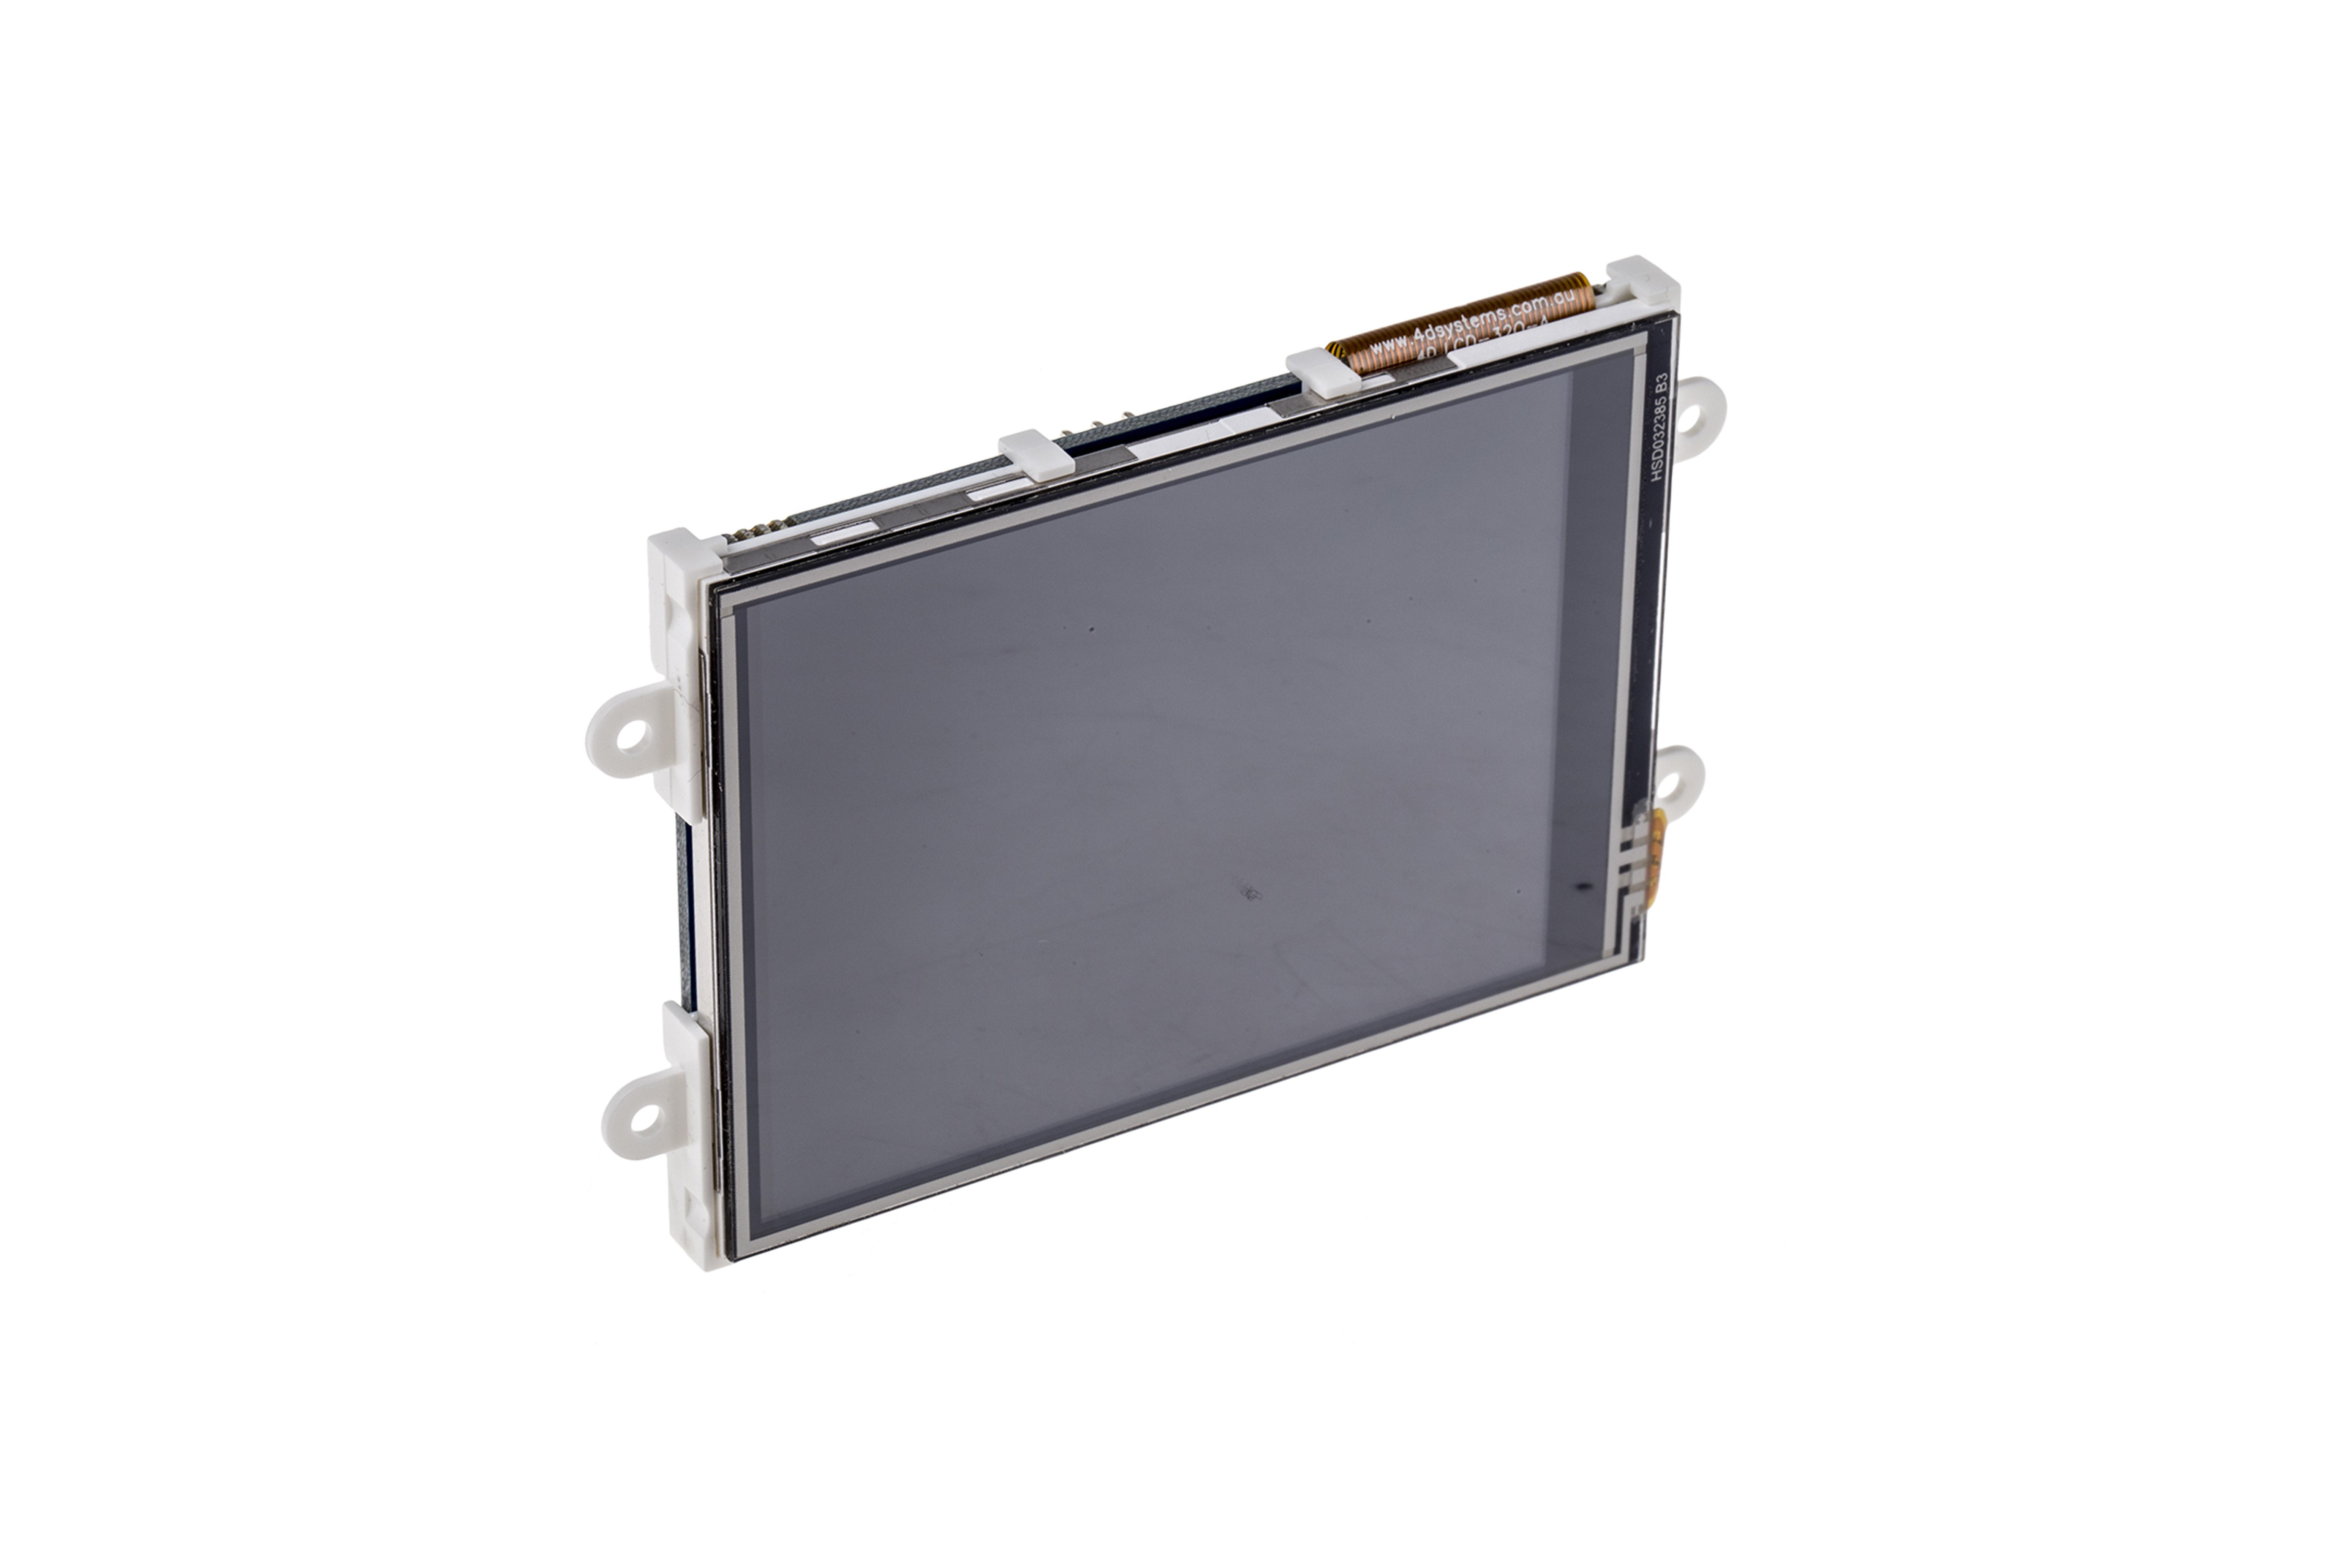 4DPI-32 MK2 TouchscreenLCDRaspberry Pi